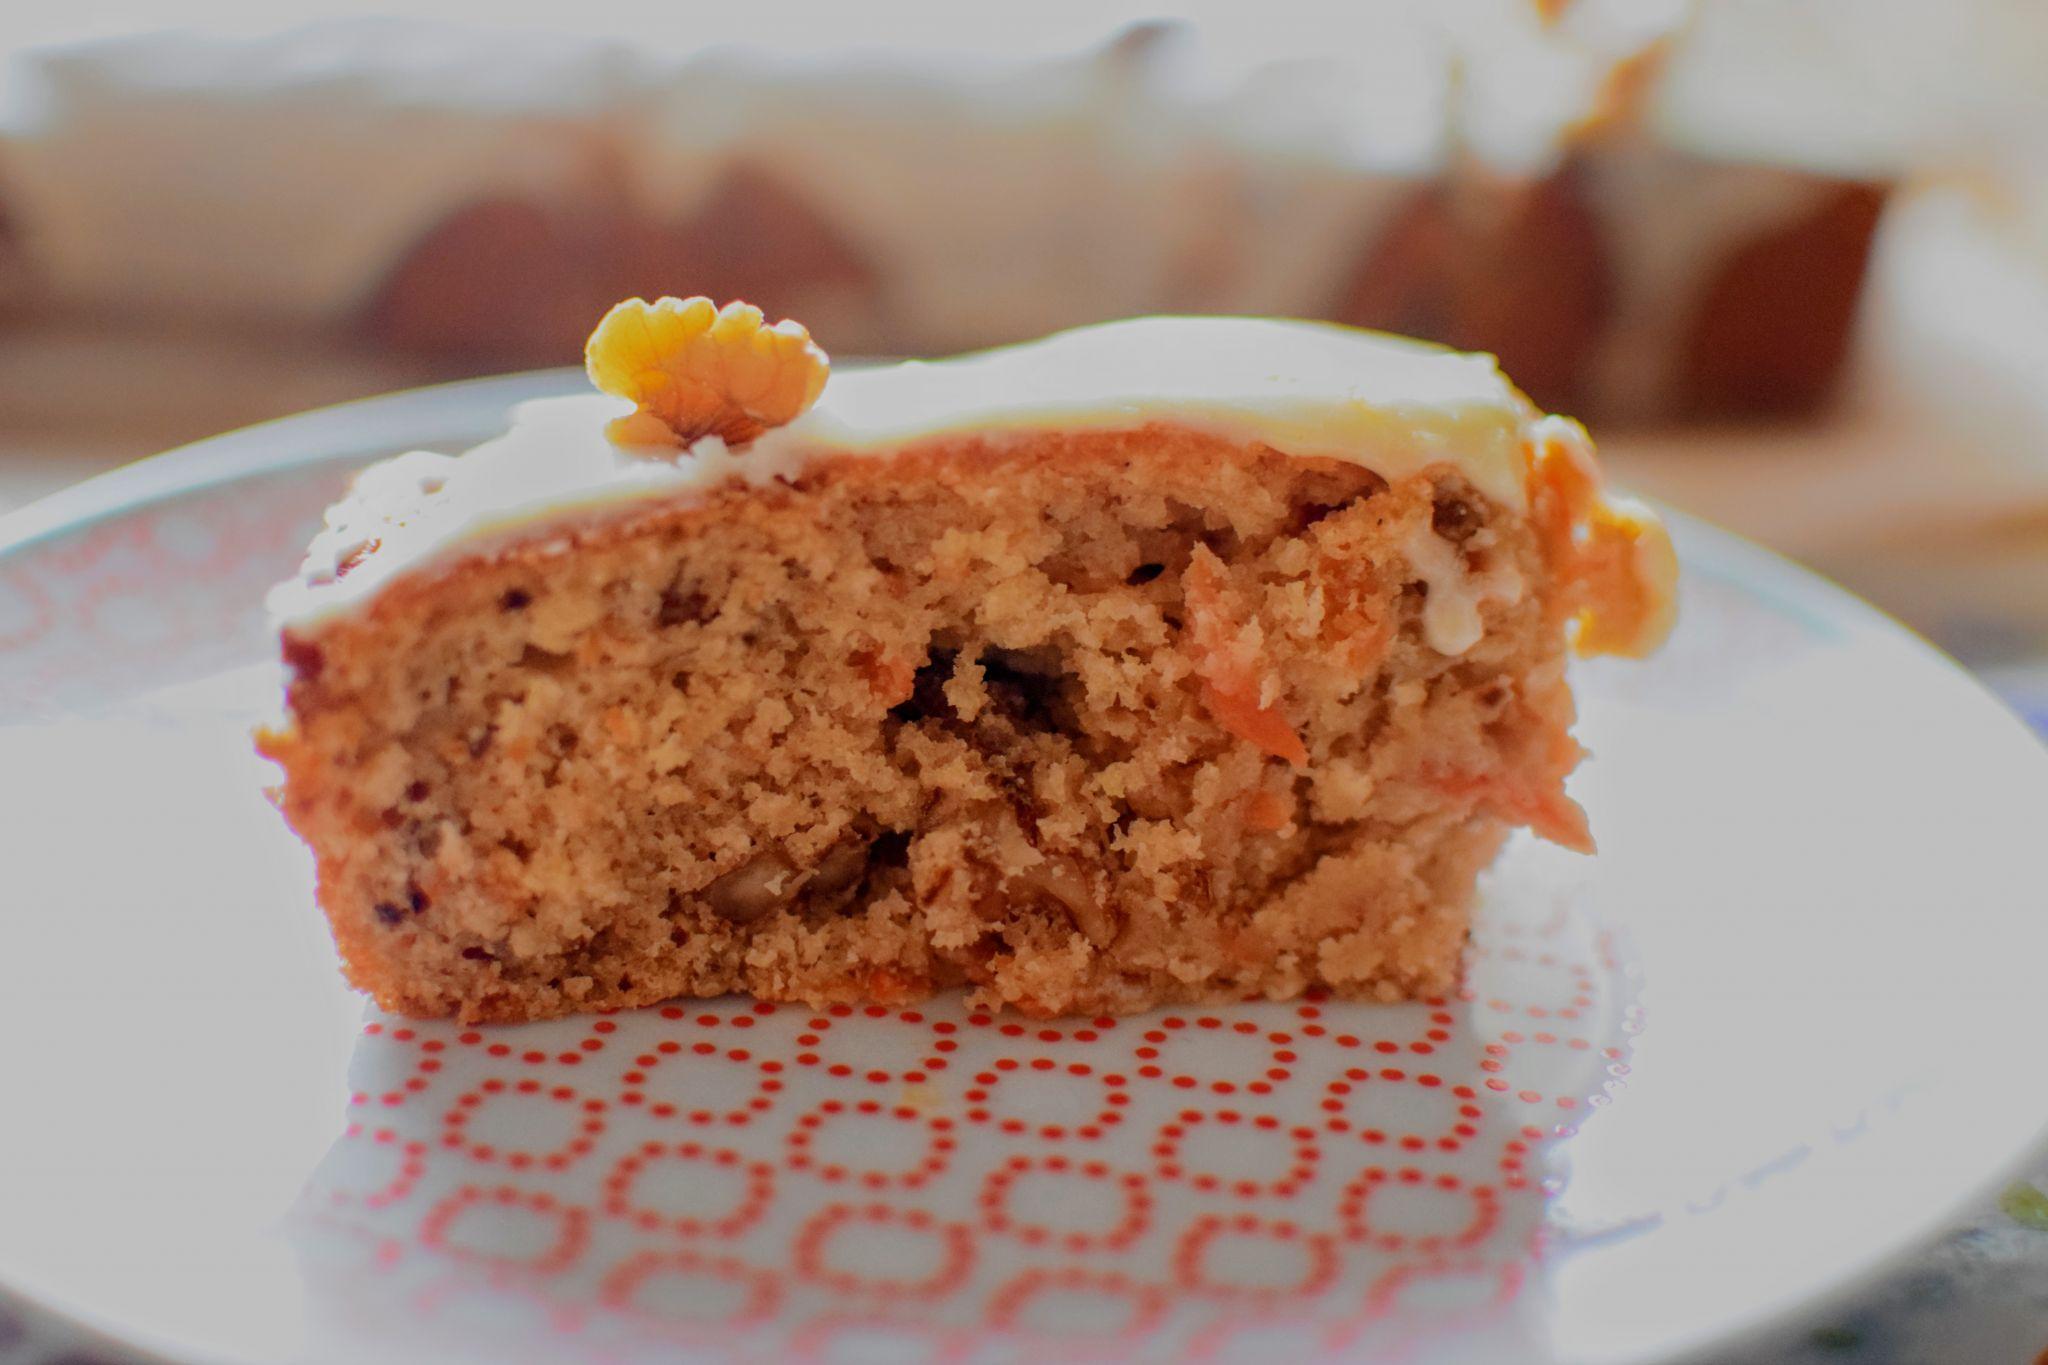 Vegan Carrot Cake, Food:  Vegan Carrot Cake with Orange Cream Frosting Recipe